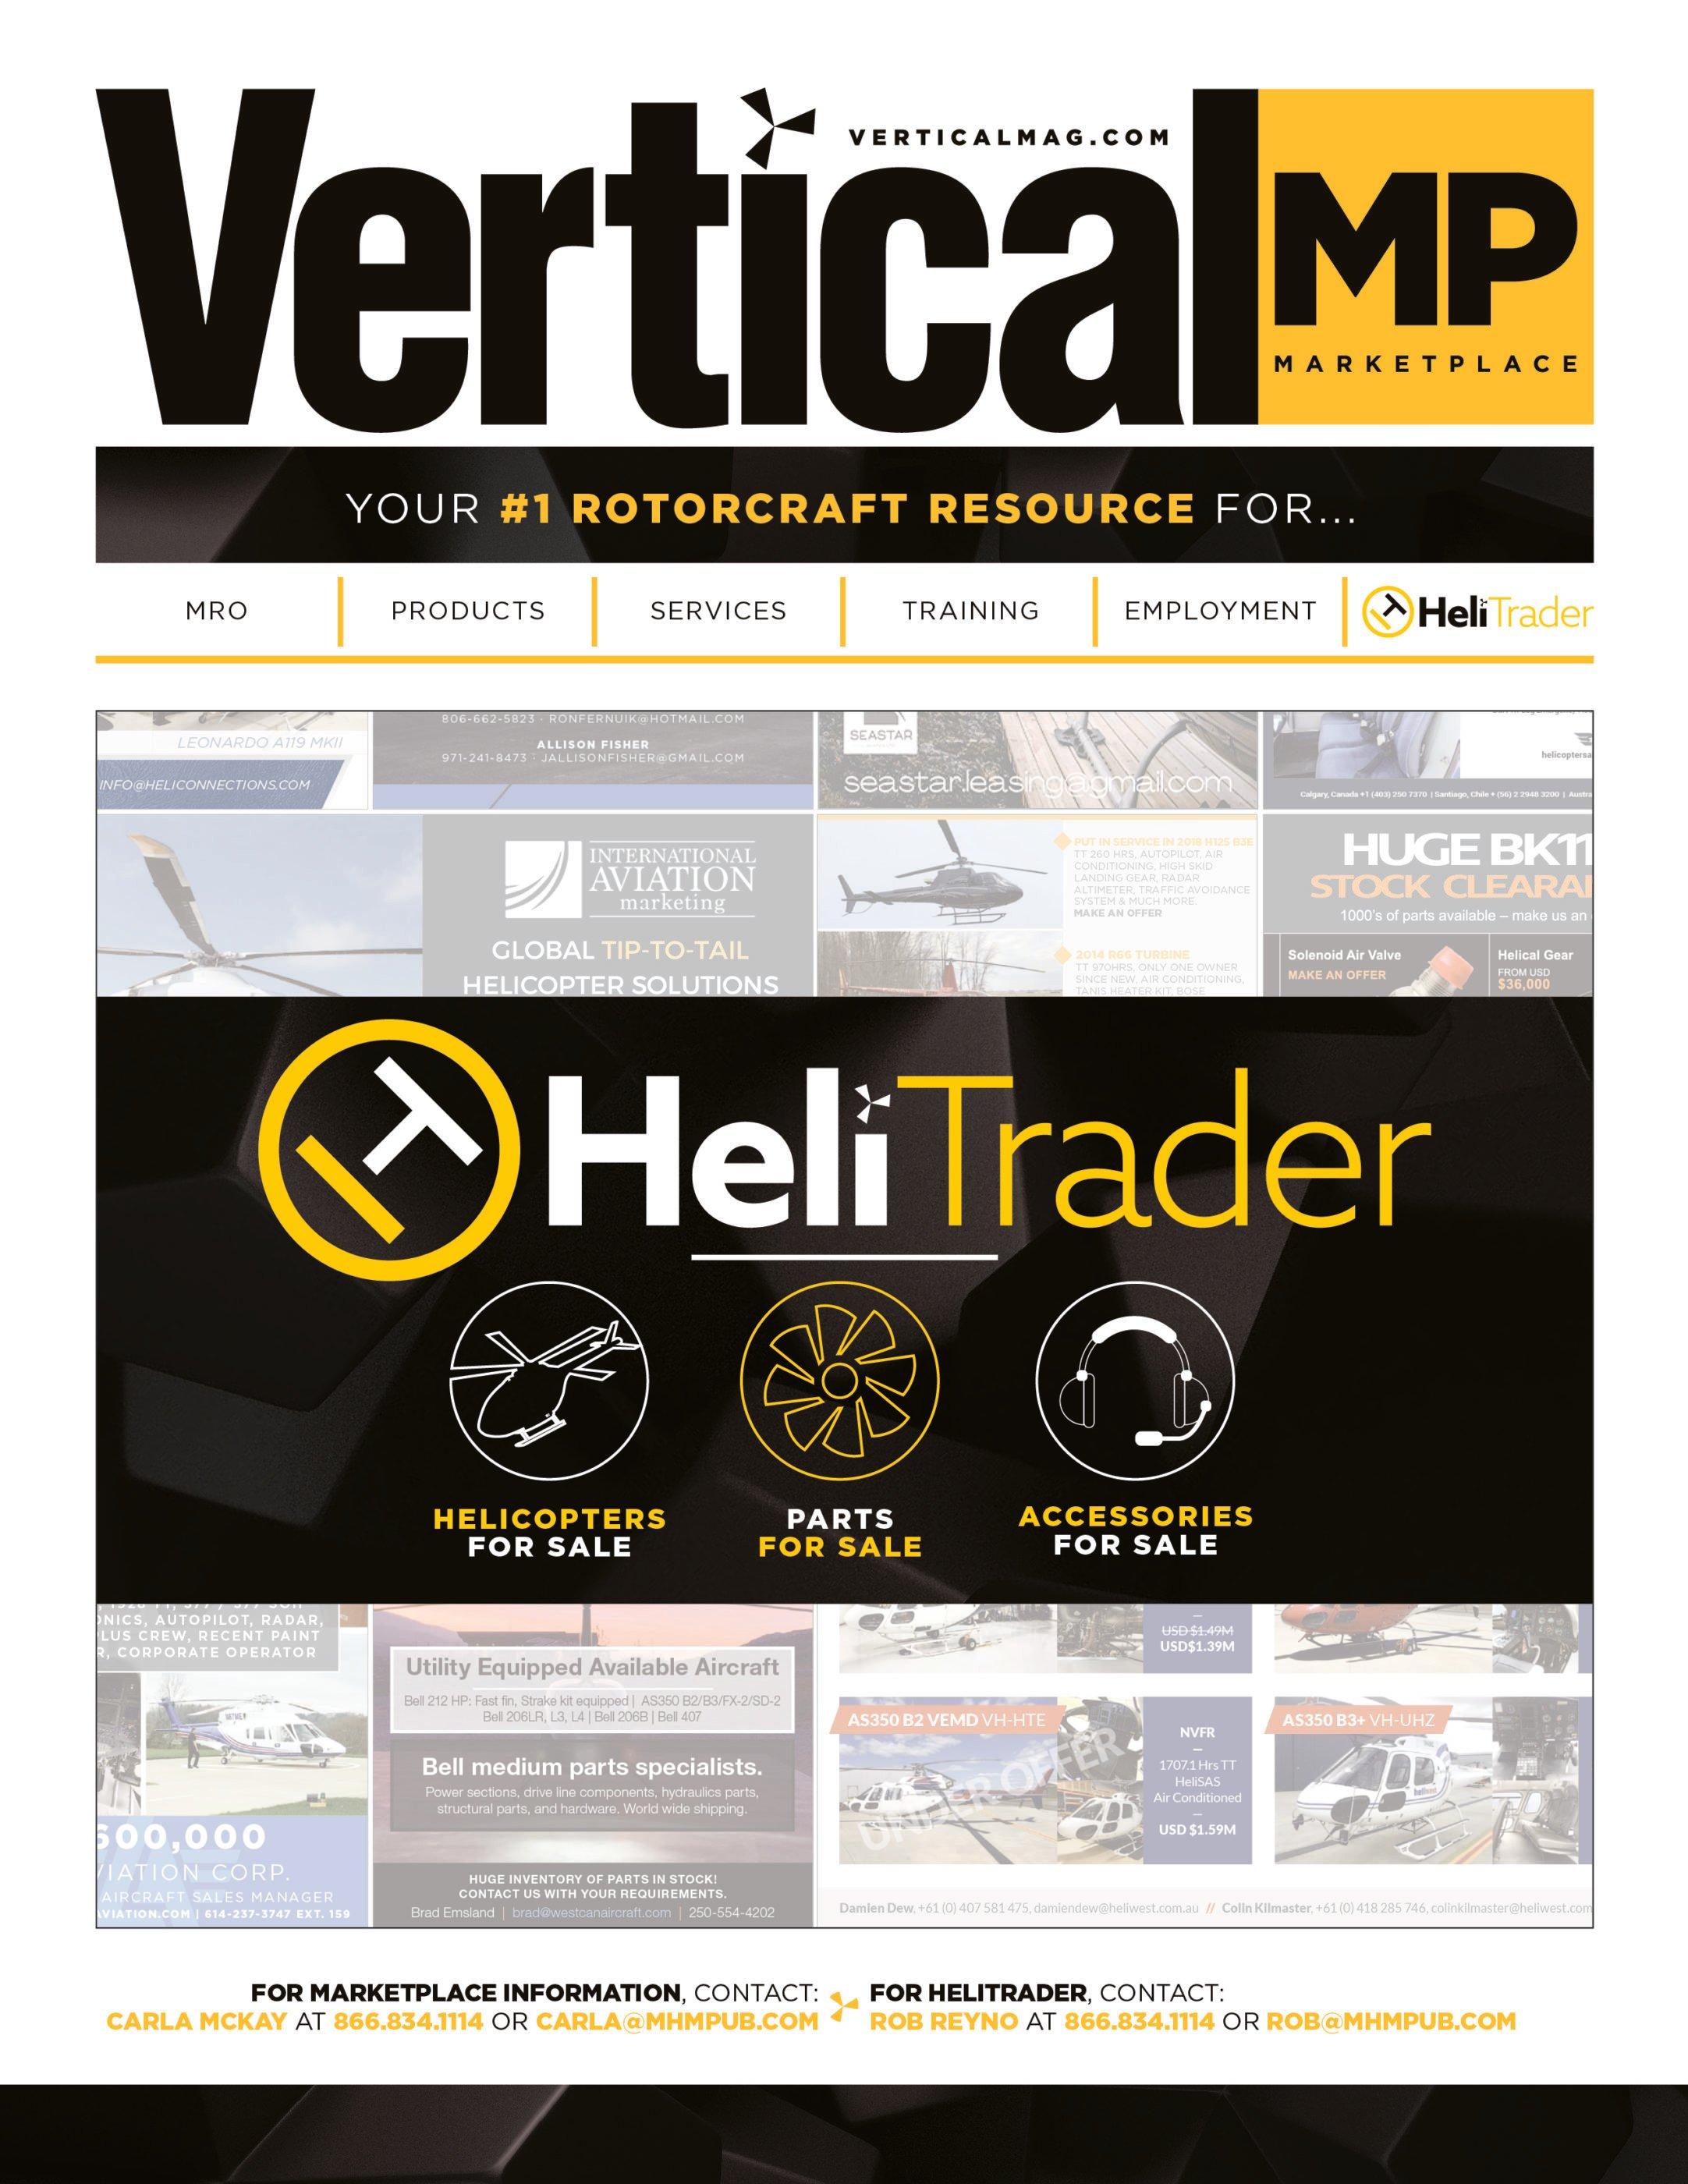 Vertical Marketplace 2020